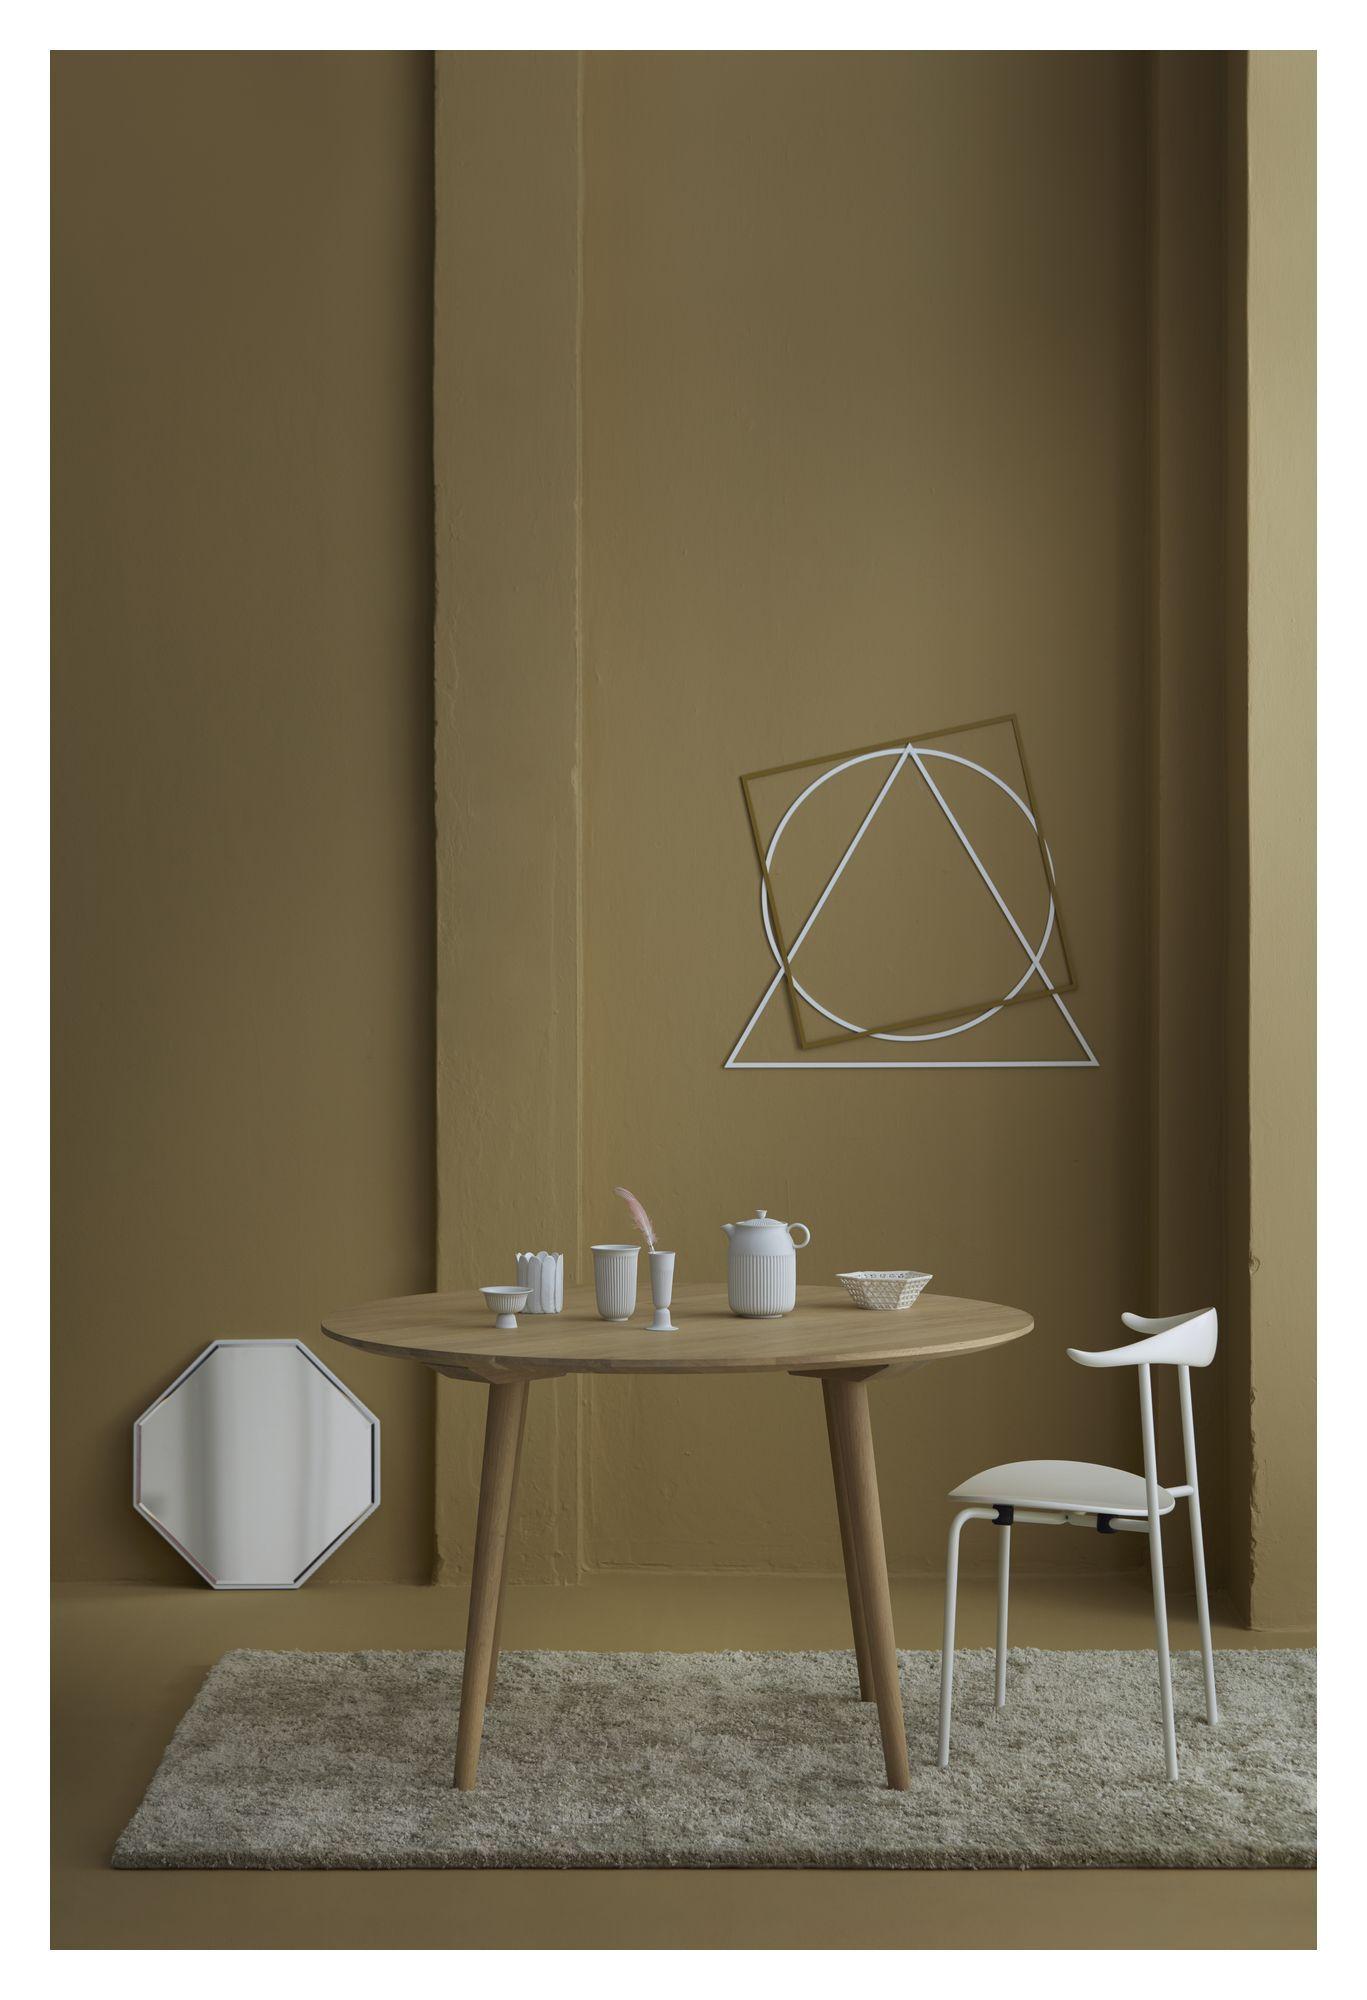 Fabula Living - Gjall Beige Luvtæppe - 160x230 - Håndvævet Luvtæppe  160x230 cm